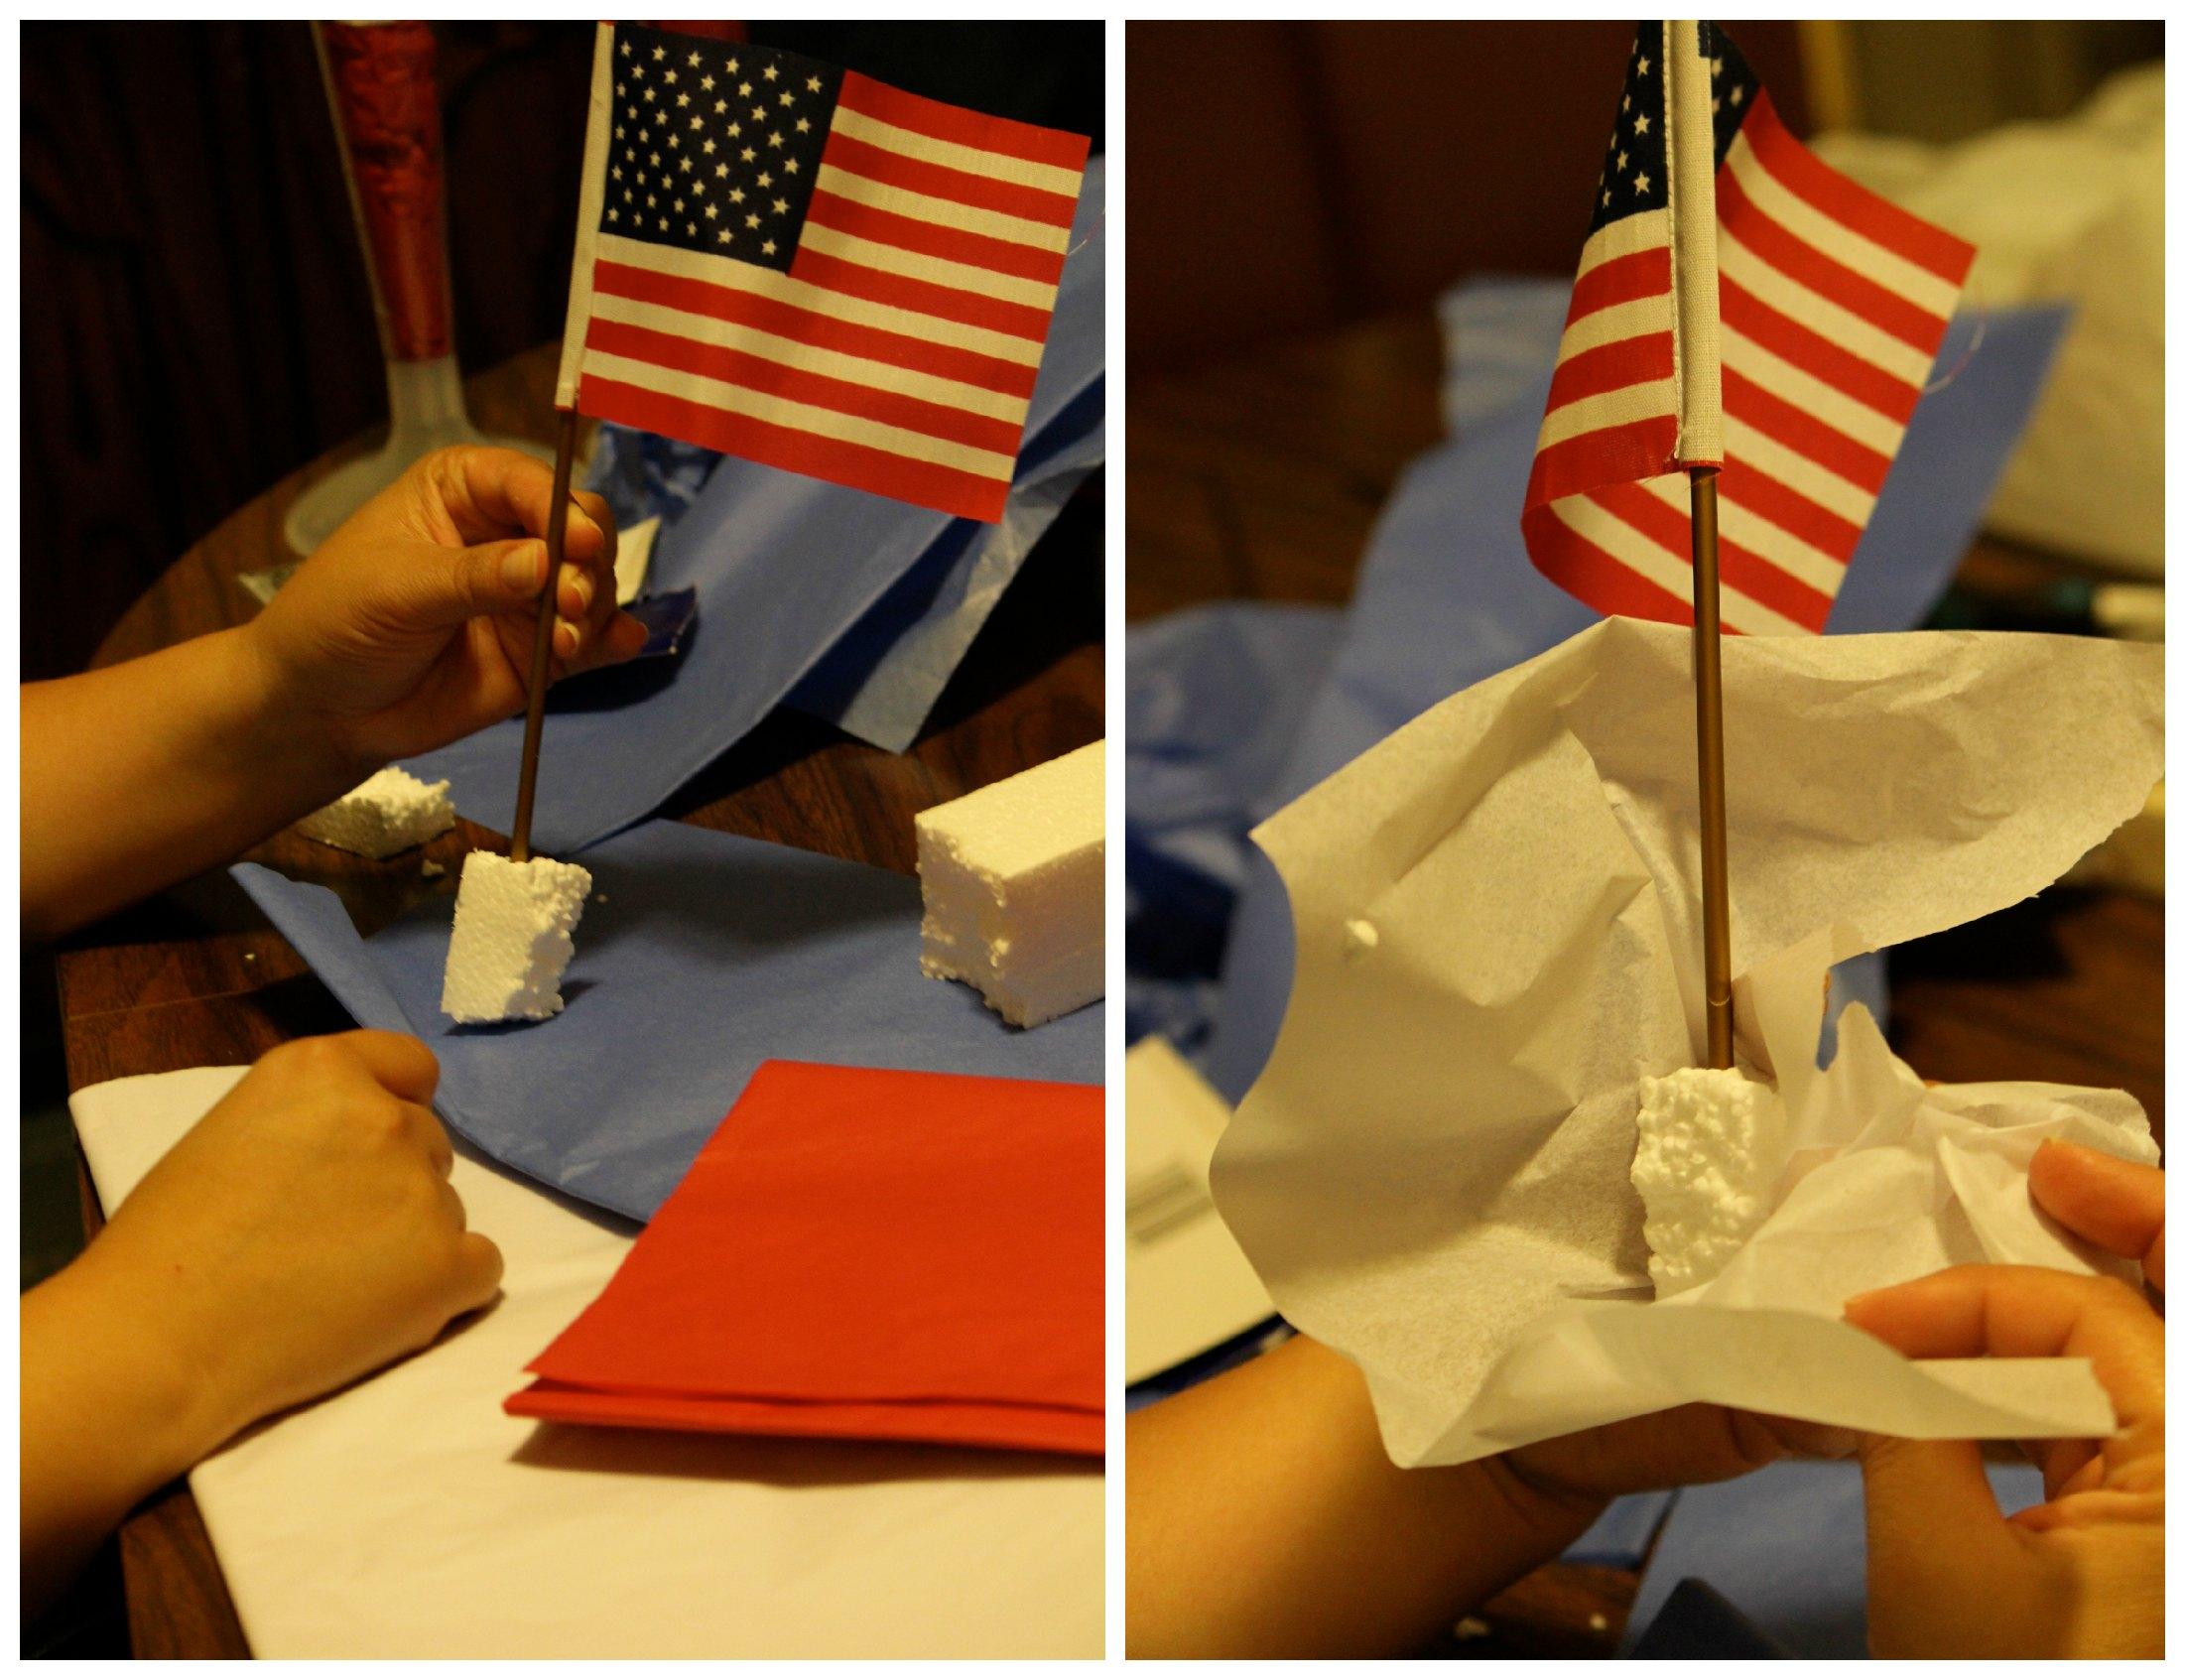 Easy Diy Patriotic 4th Of July Table Decor Mom Endeavors